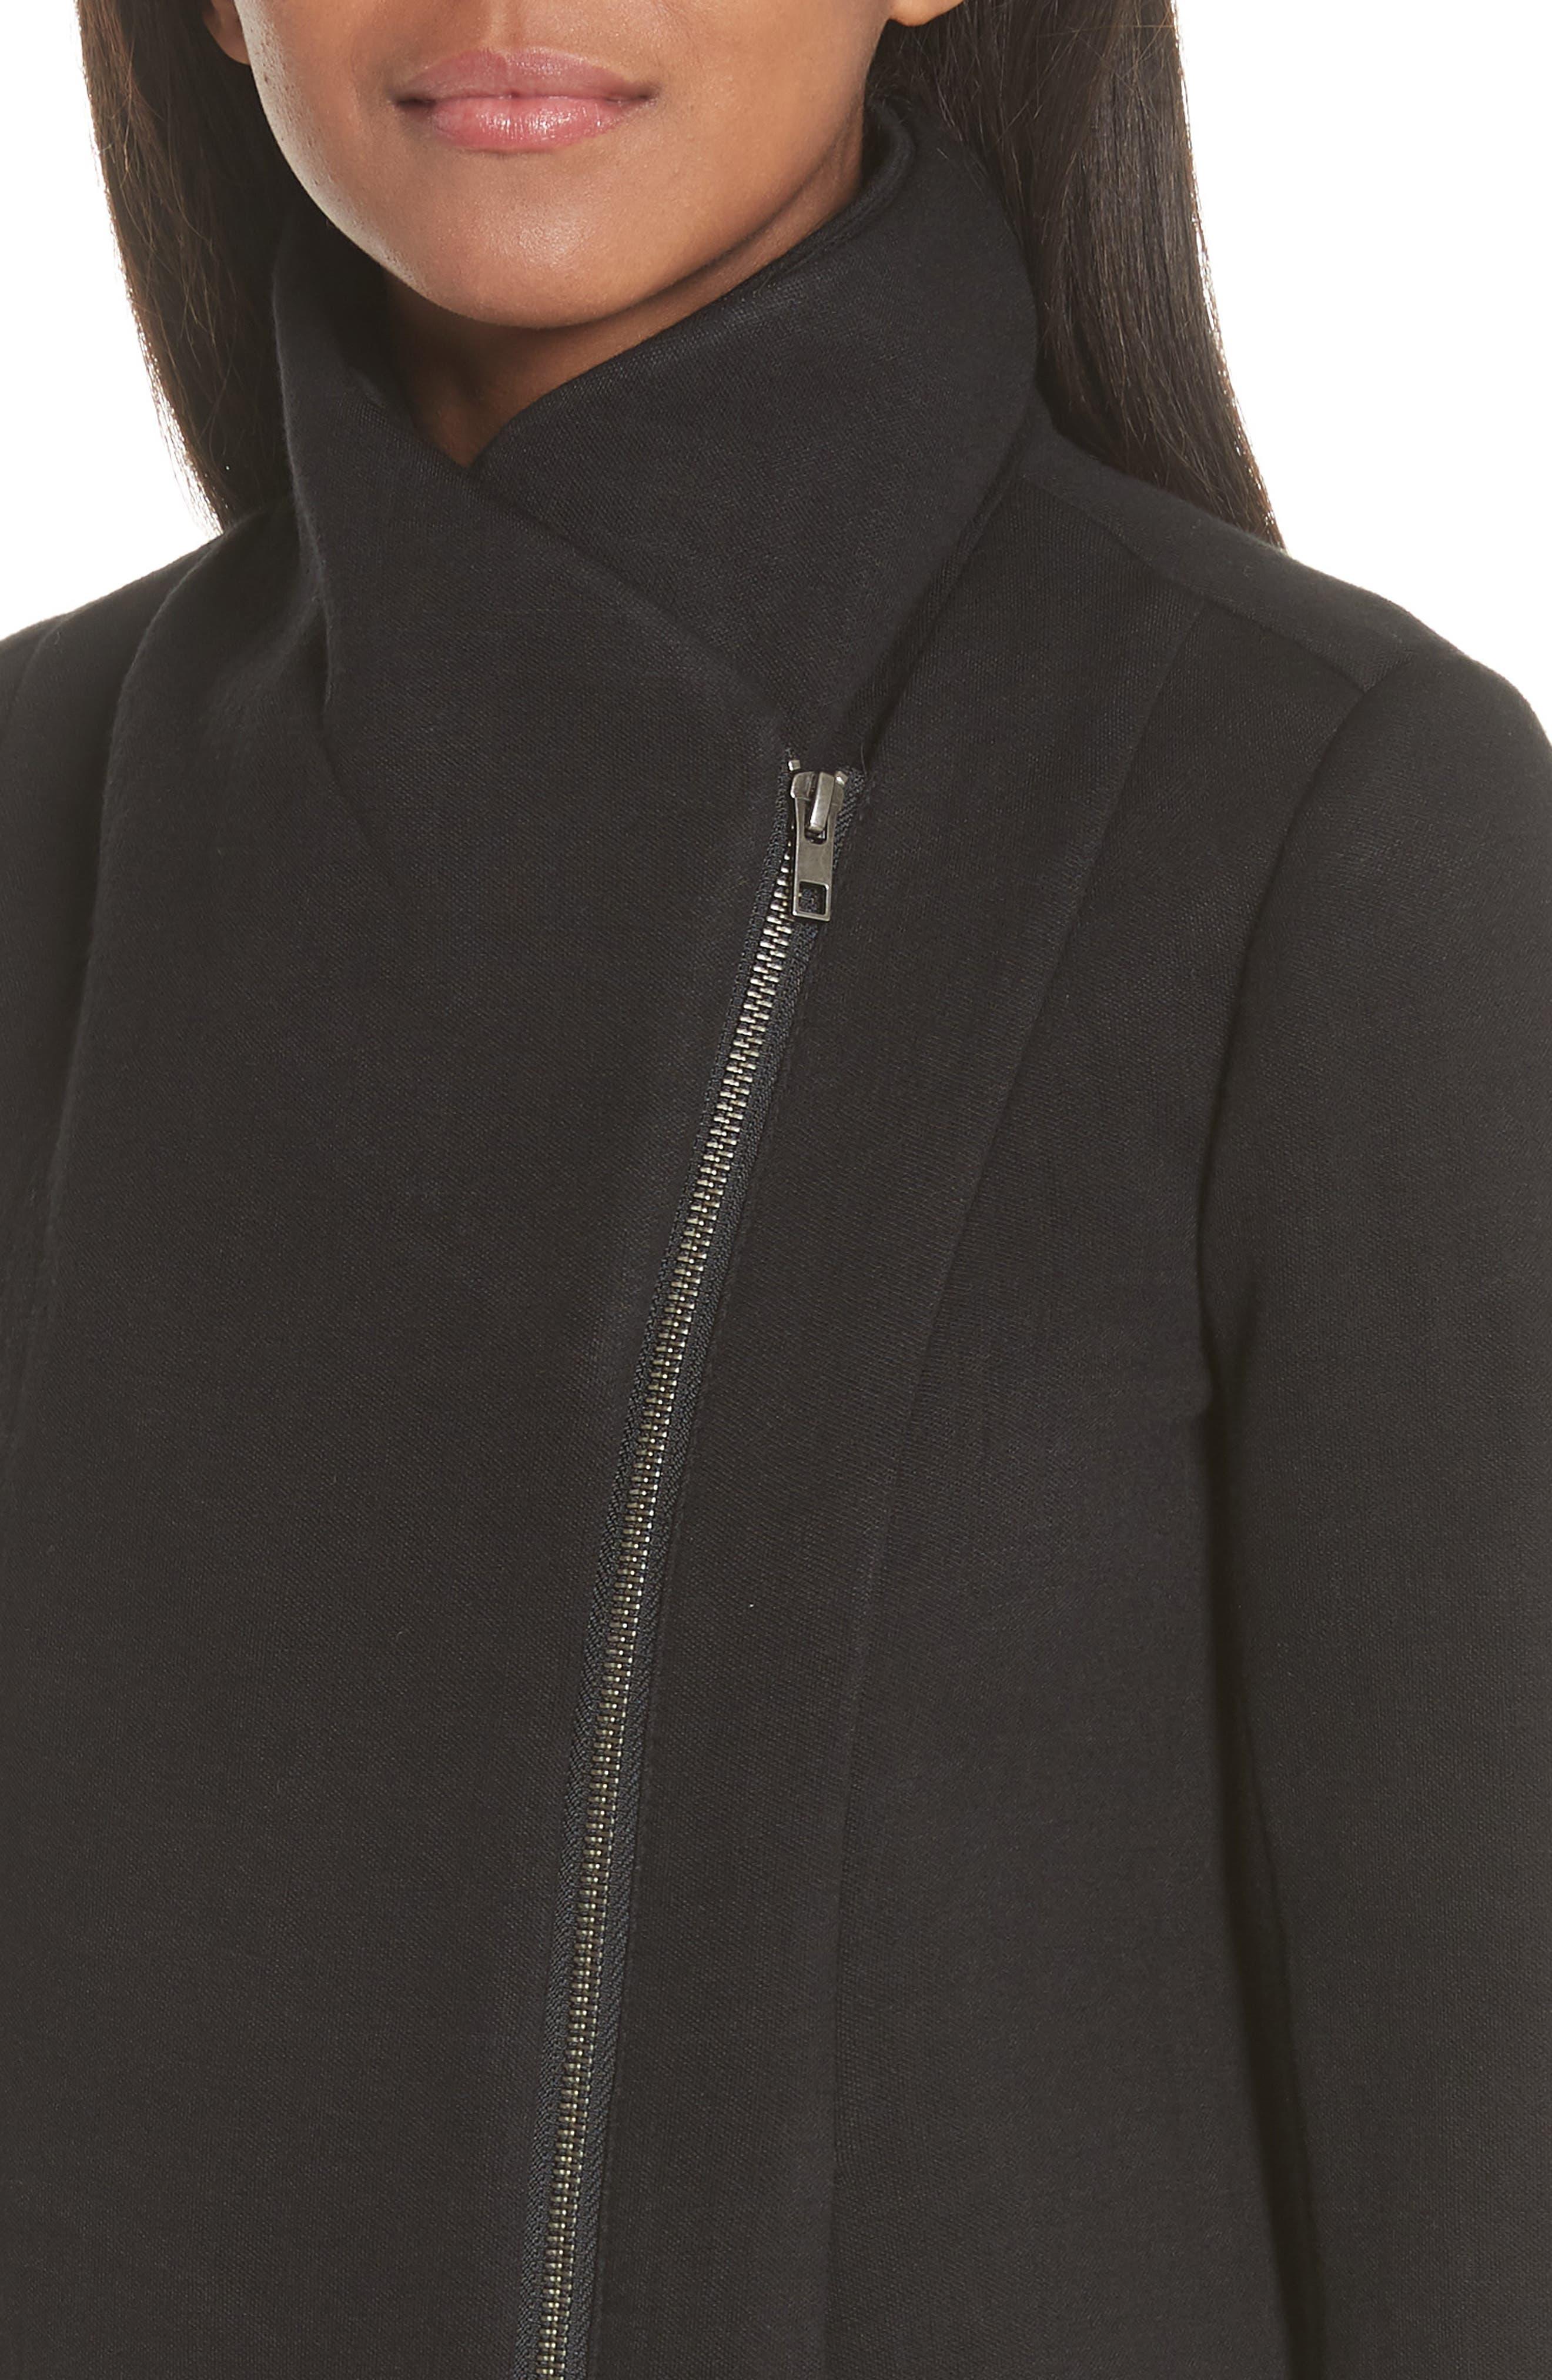 Knit Moto Jacket,                             Alternate thumbnail 4, color,                             001